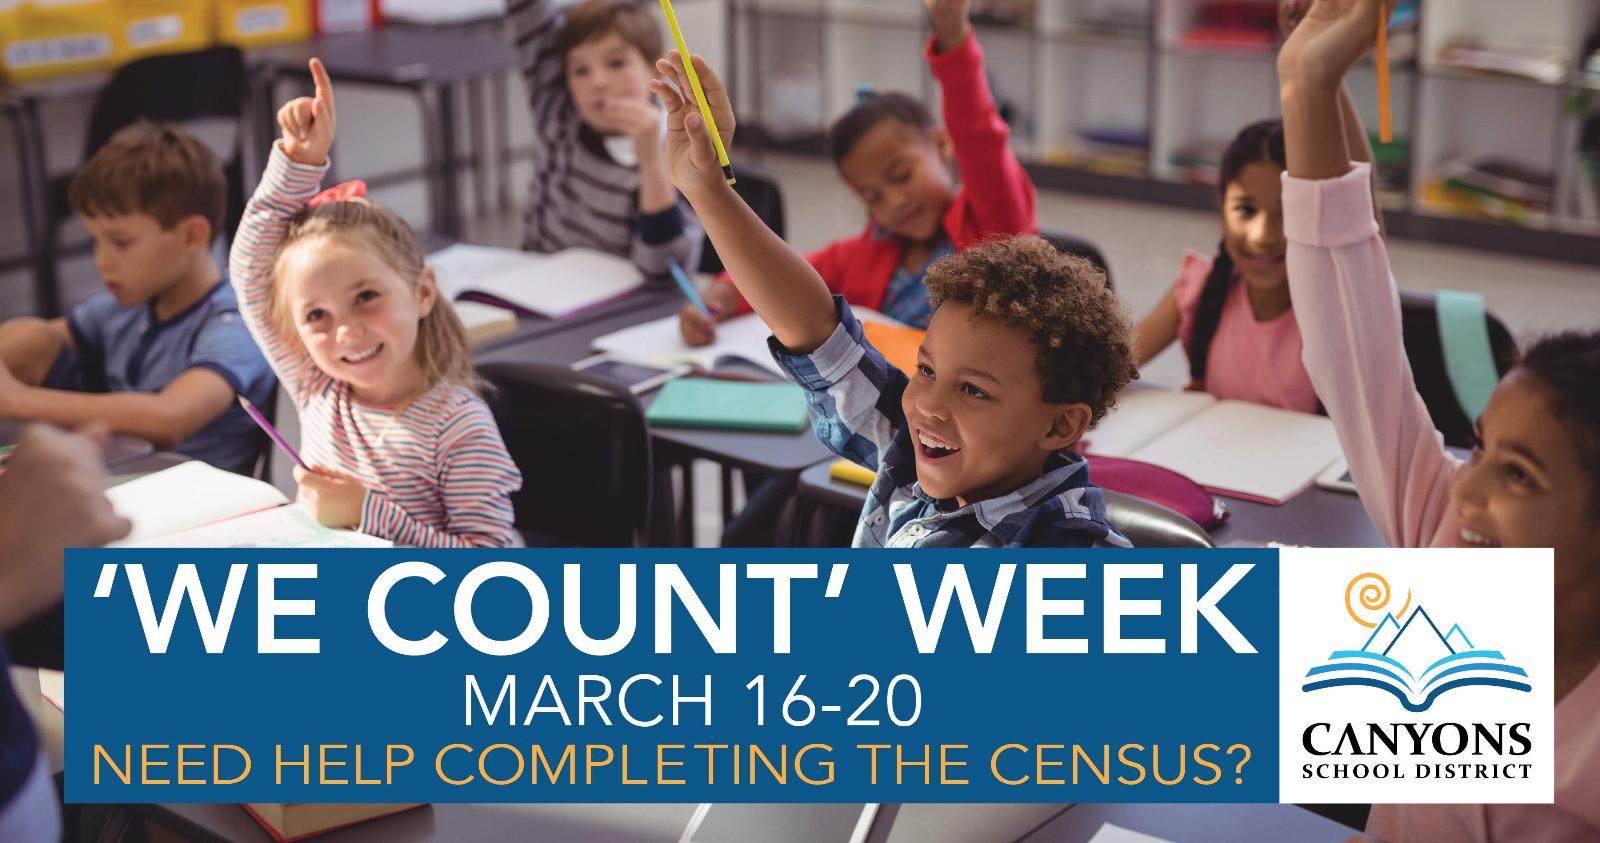 'We Count' Week Census Survey